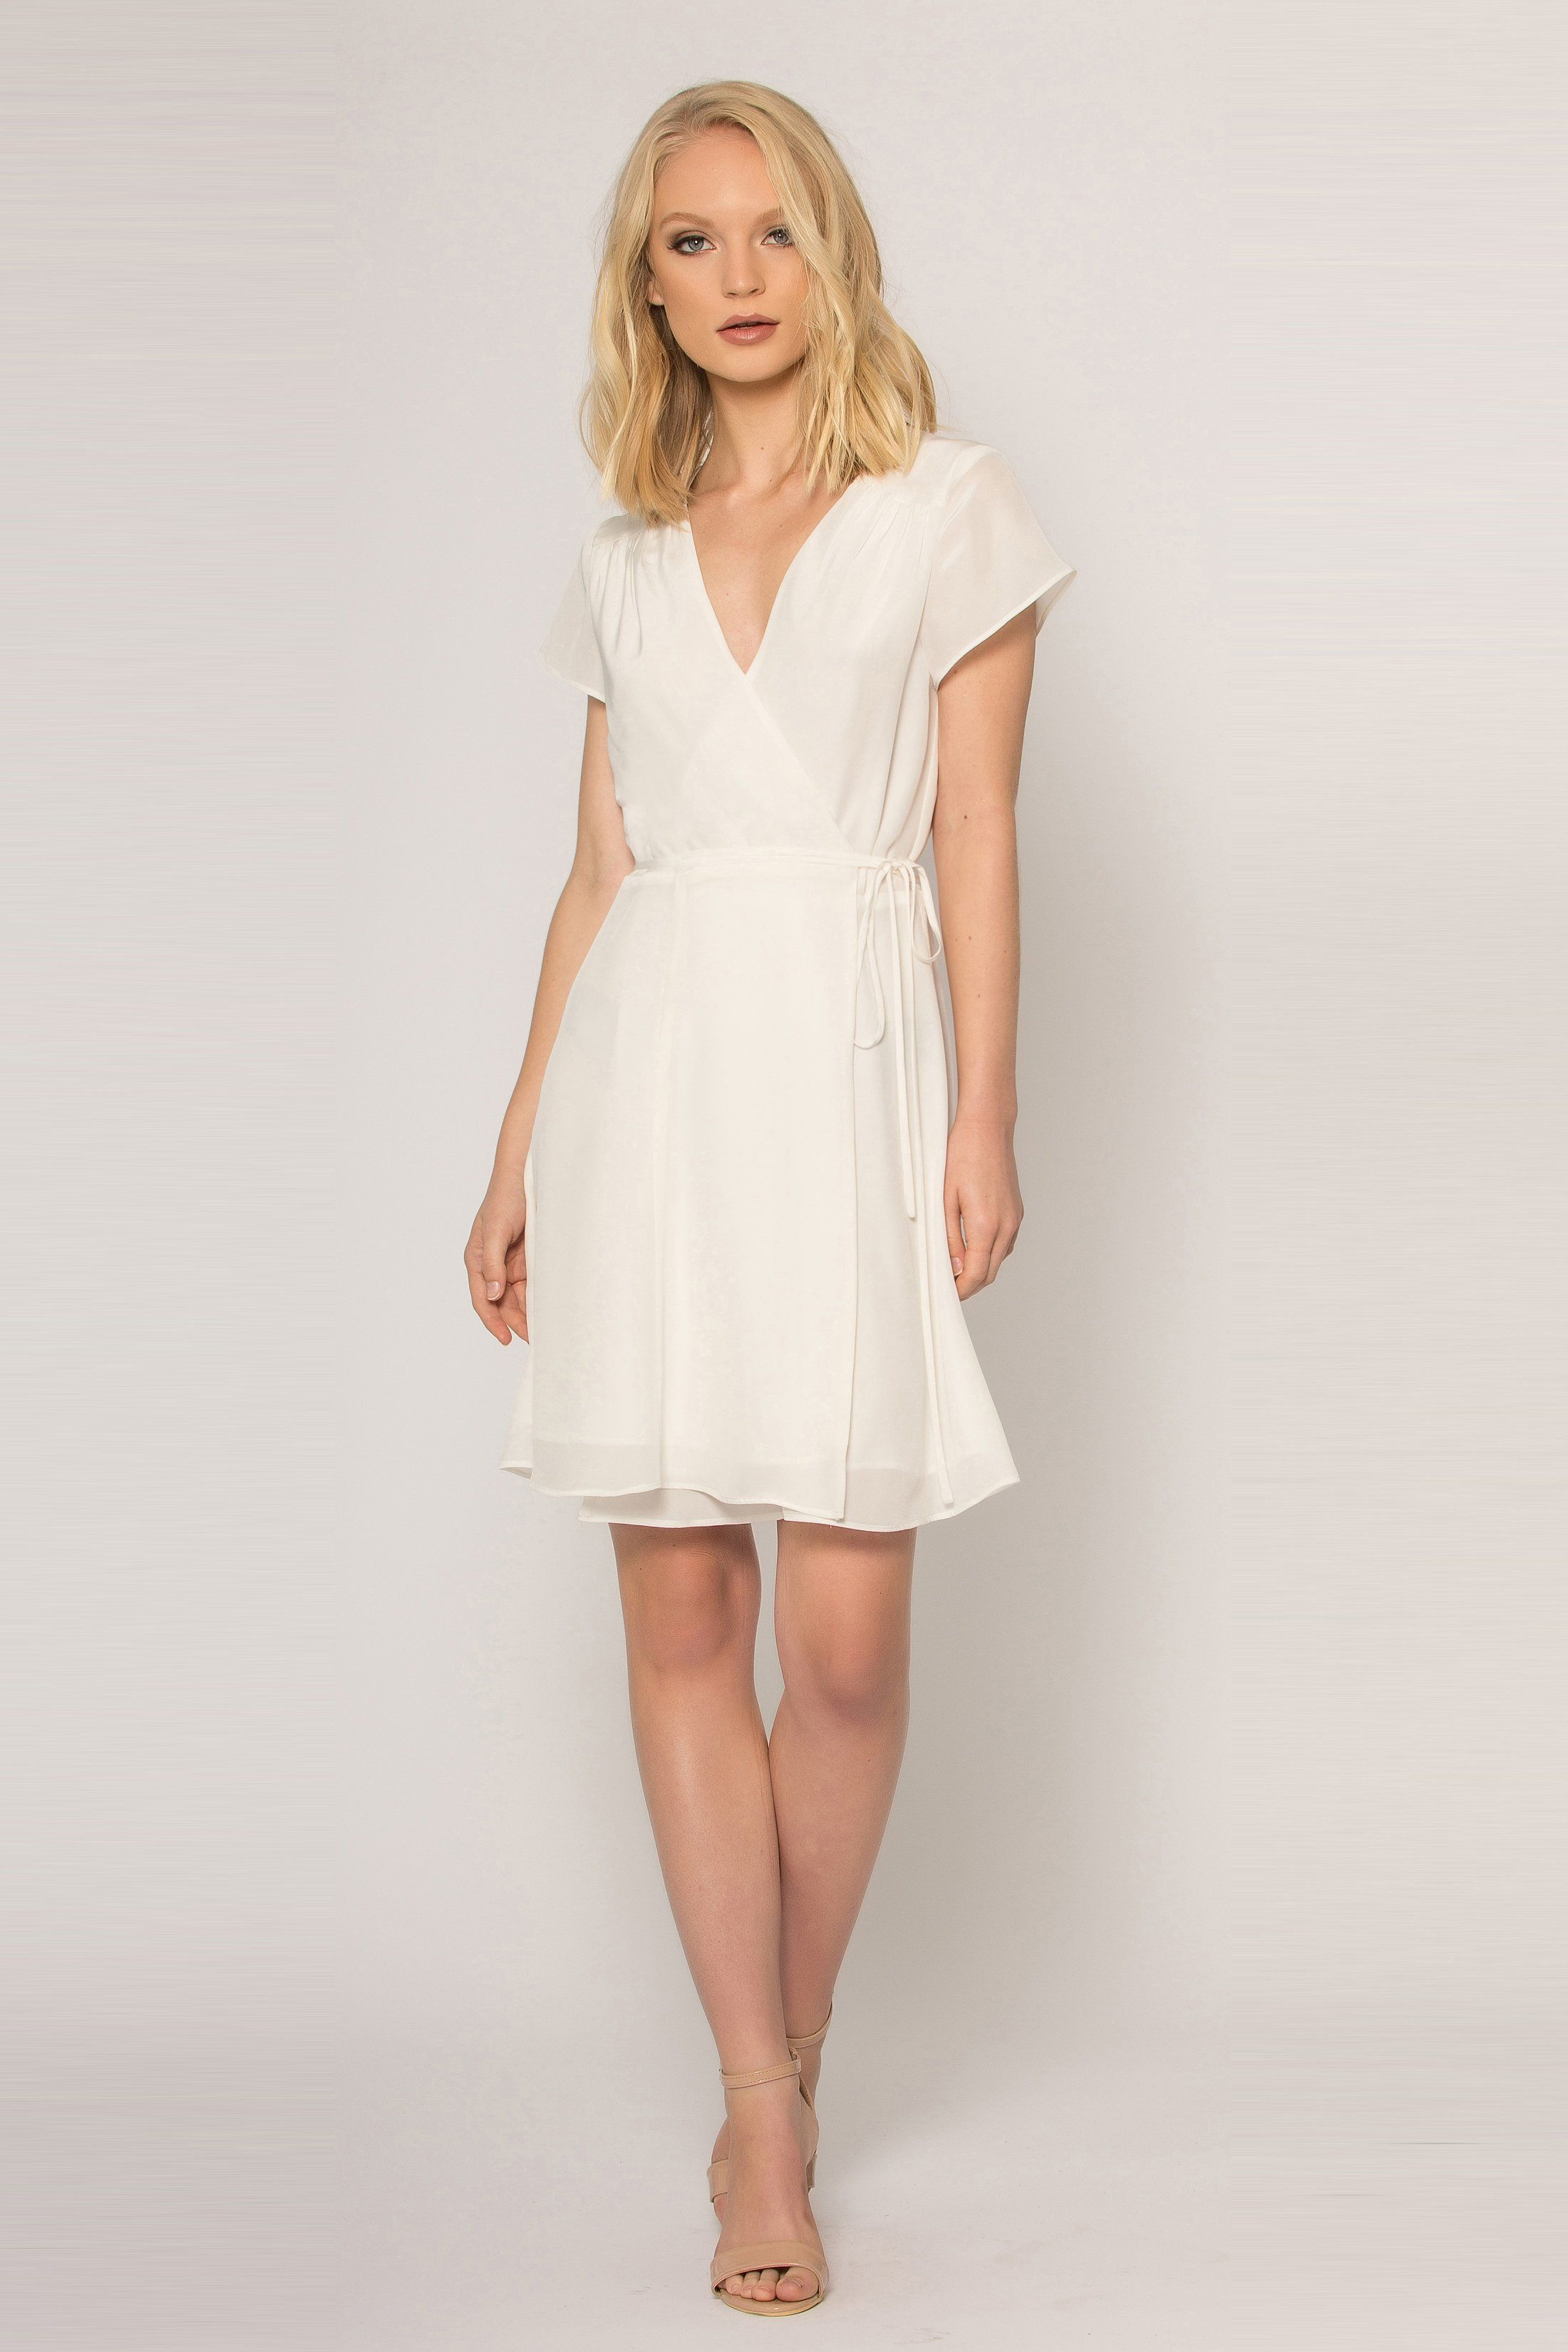 Ivory Short Sleeve Silk Wrap Dress In 2021 Silk Wrap Dresses Wrap Dress Short Brown Silk Dress [ 3300 x 2200 Pixel ]